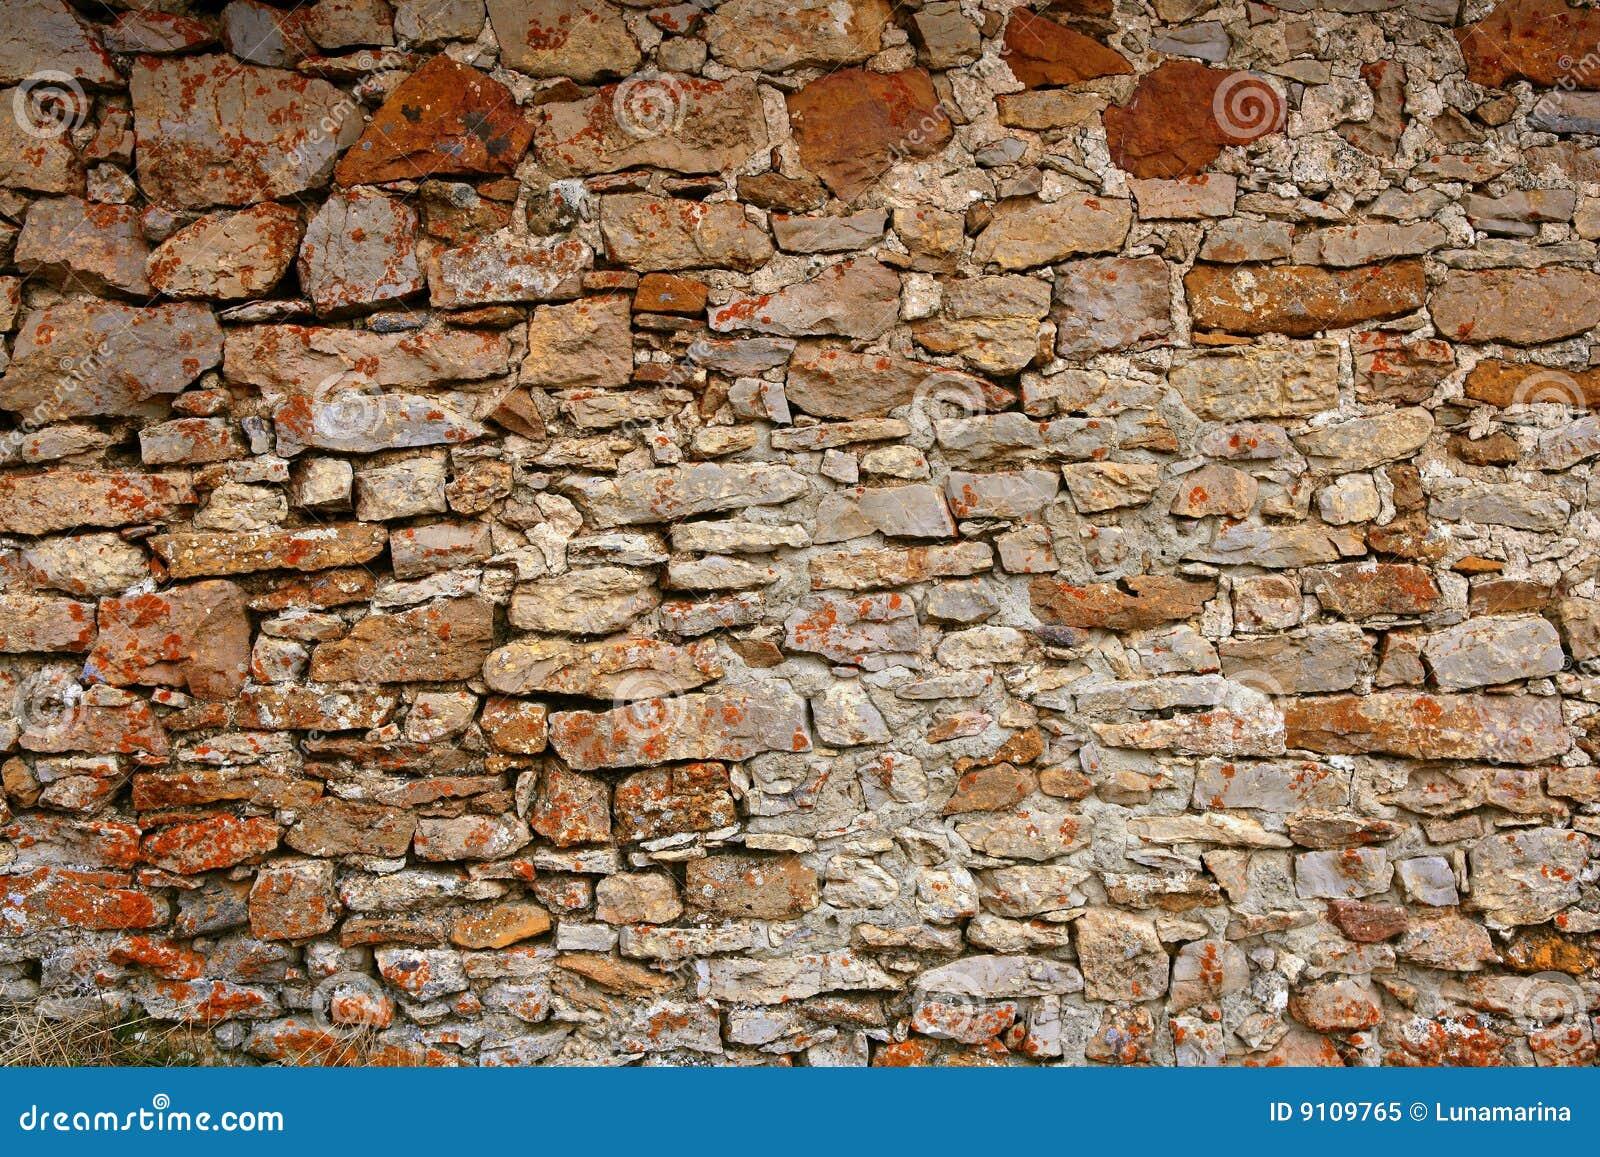 Masonry In Spain Old Stone Walls Royalty Free Stock Photo